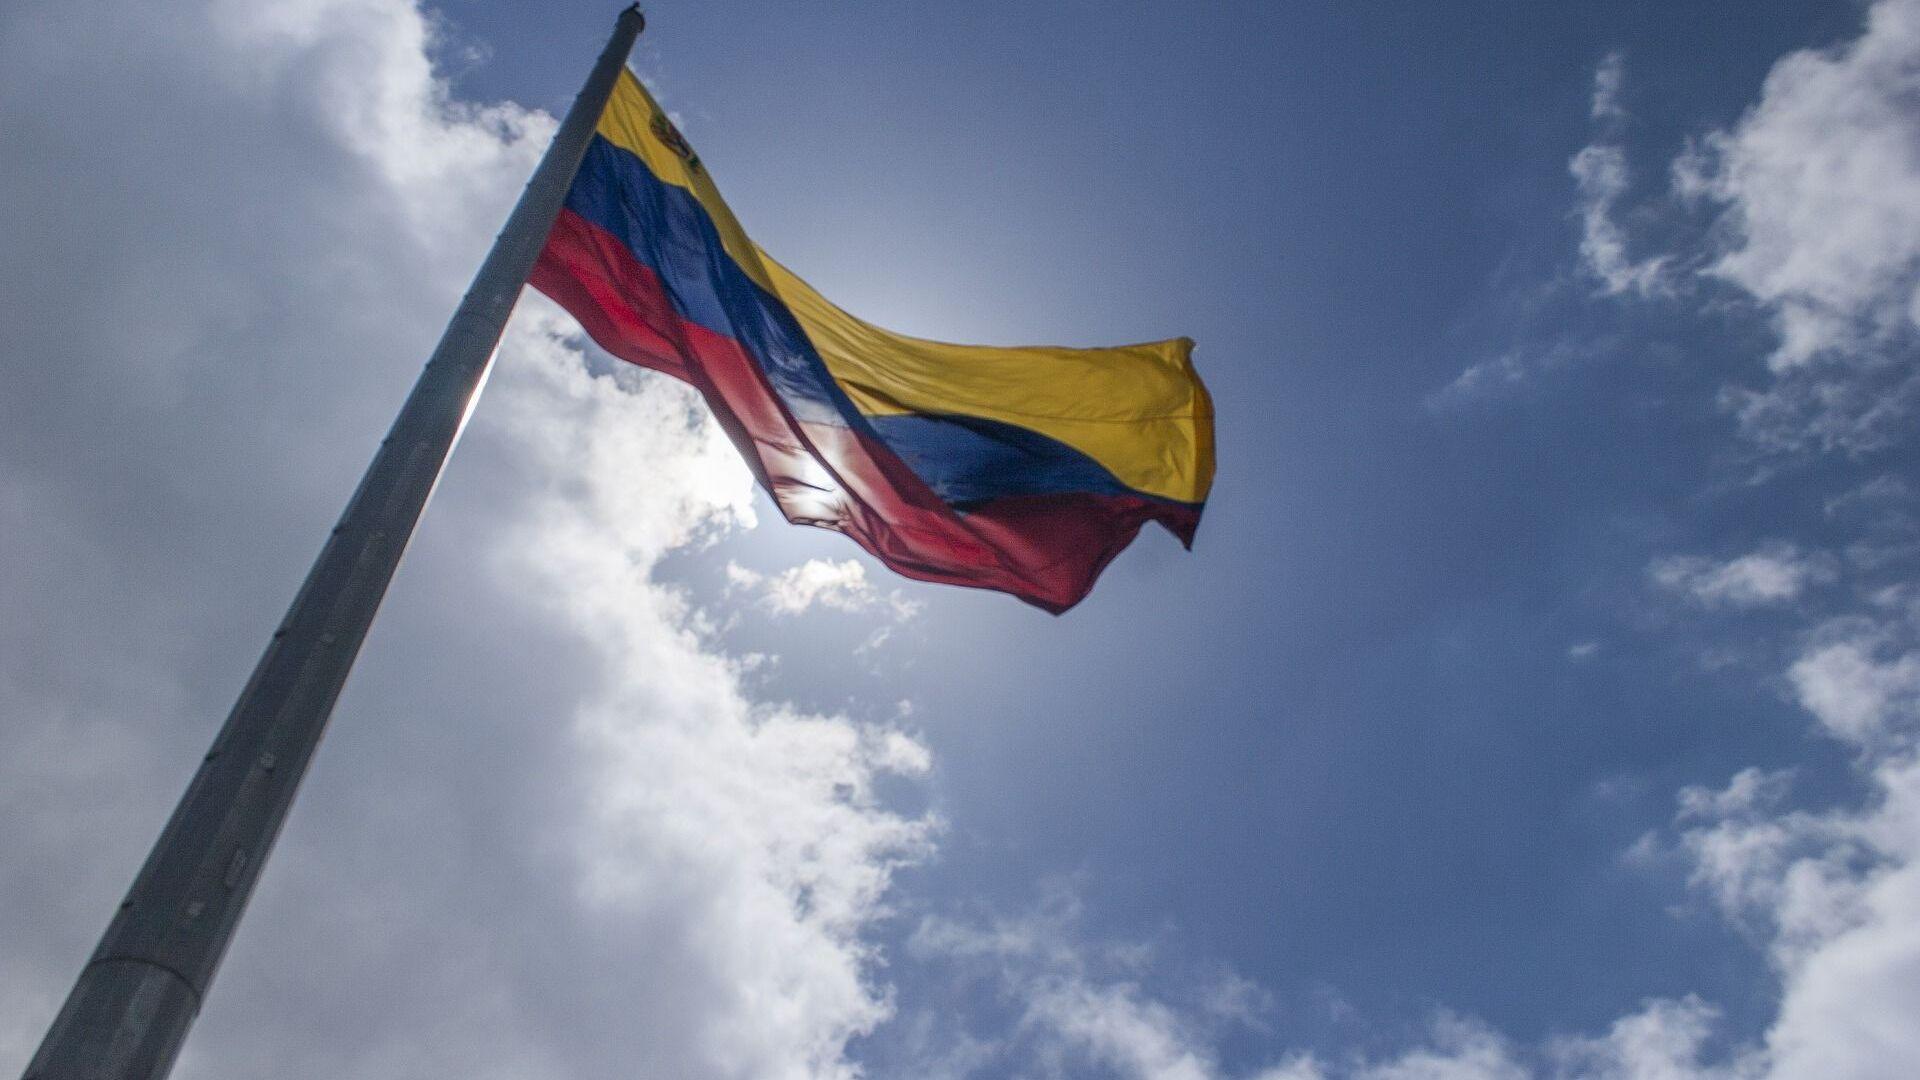 Bandera de Venezuela - Sputnik Mundo, 1920, 02.02.2021